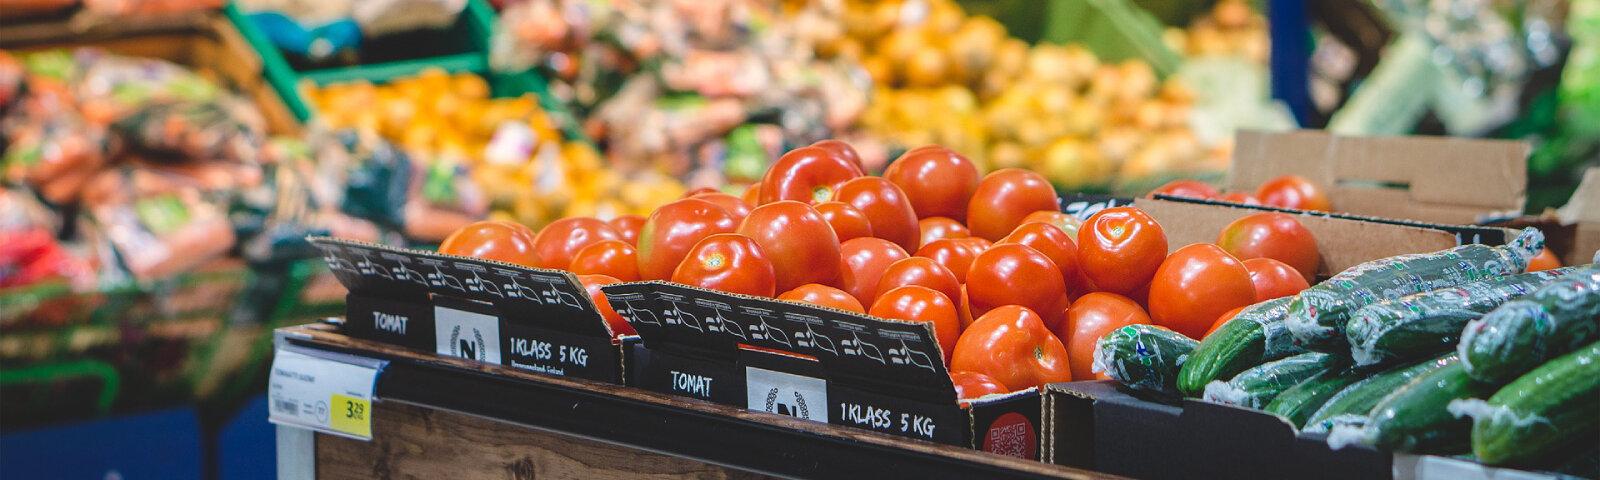 BF-supermarktindeling-1600x480.jpg